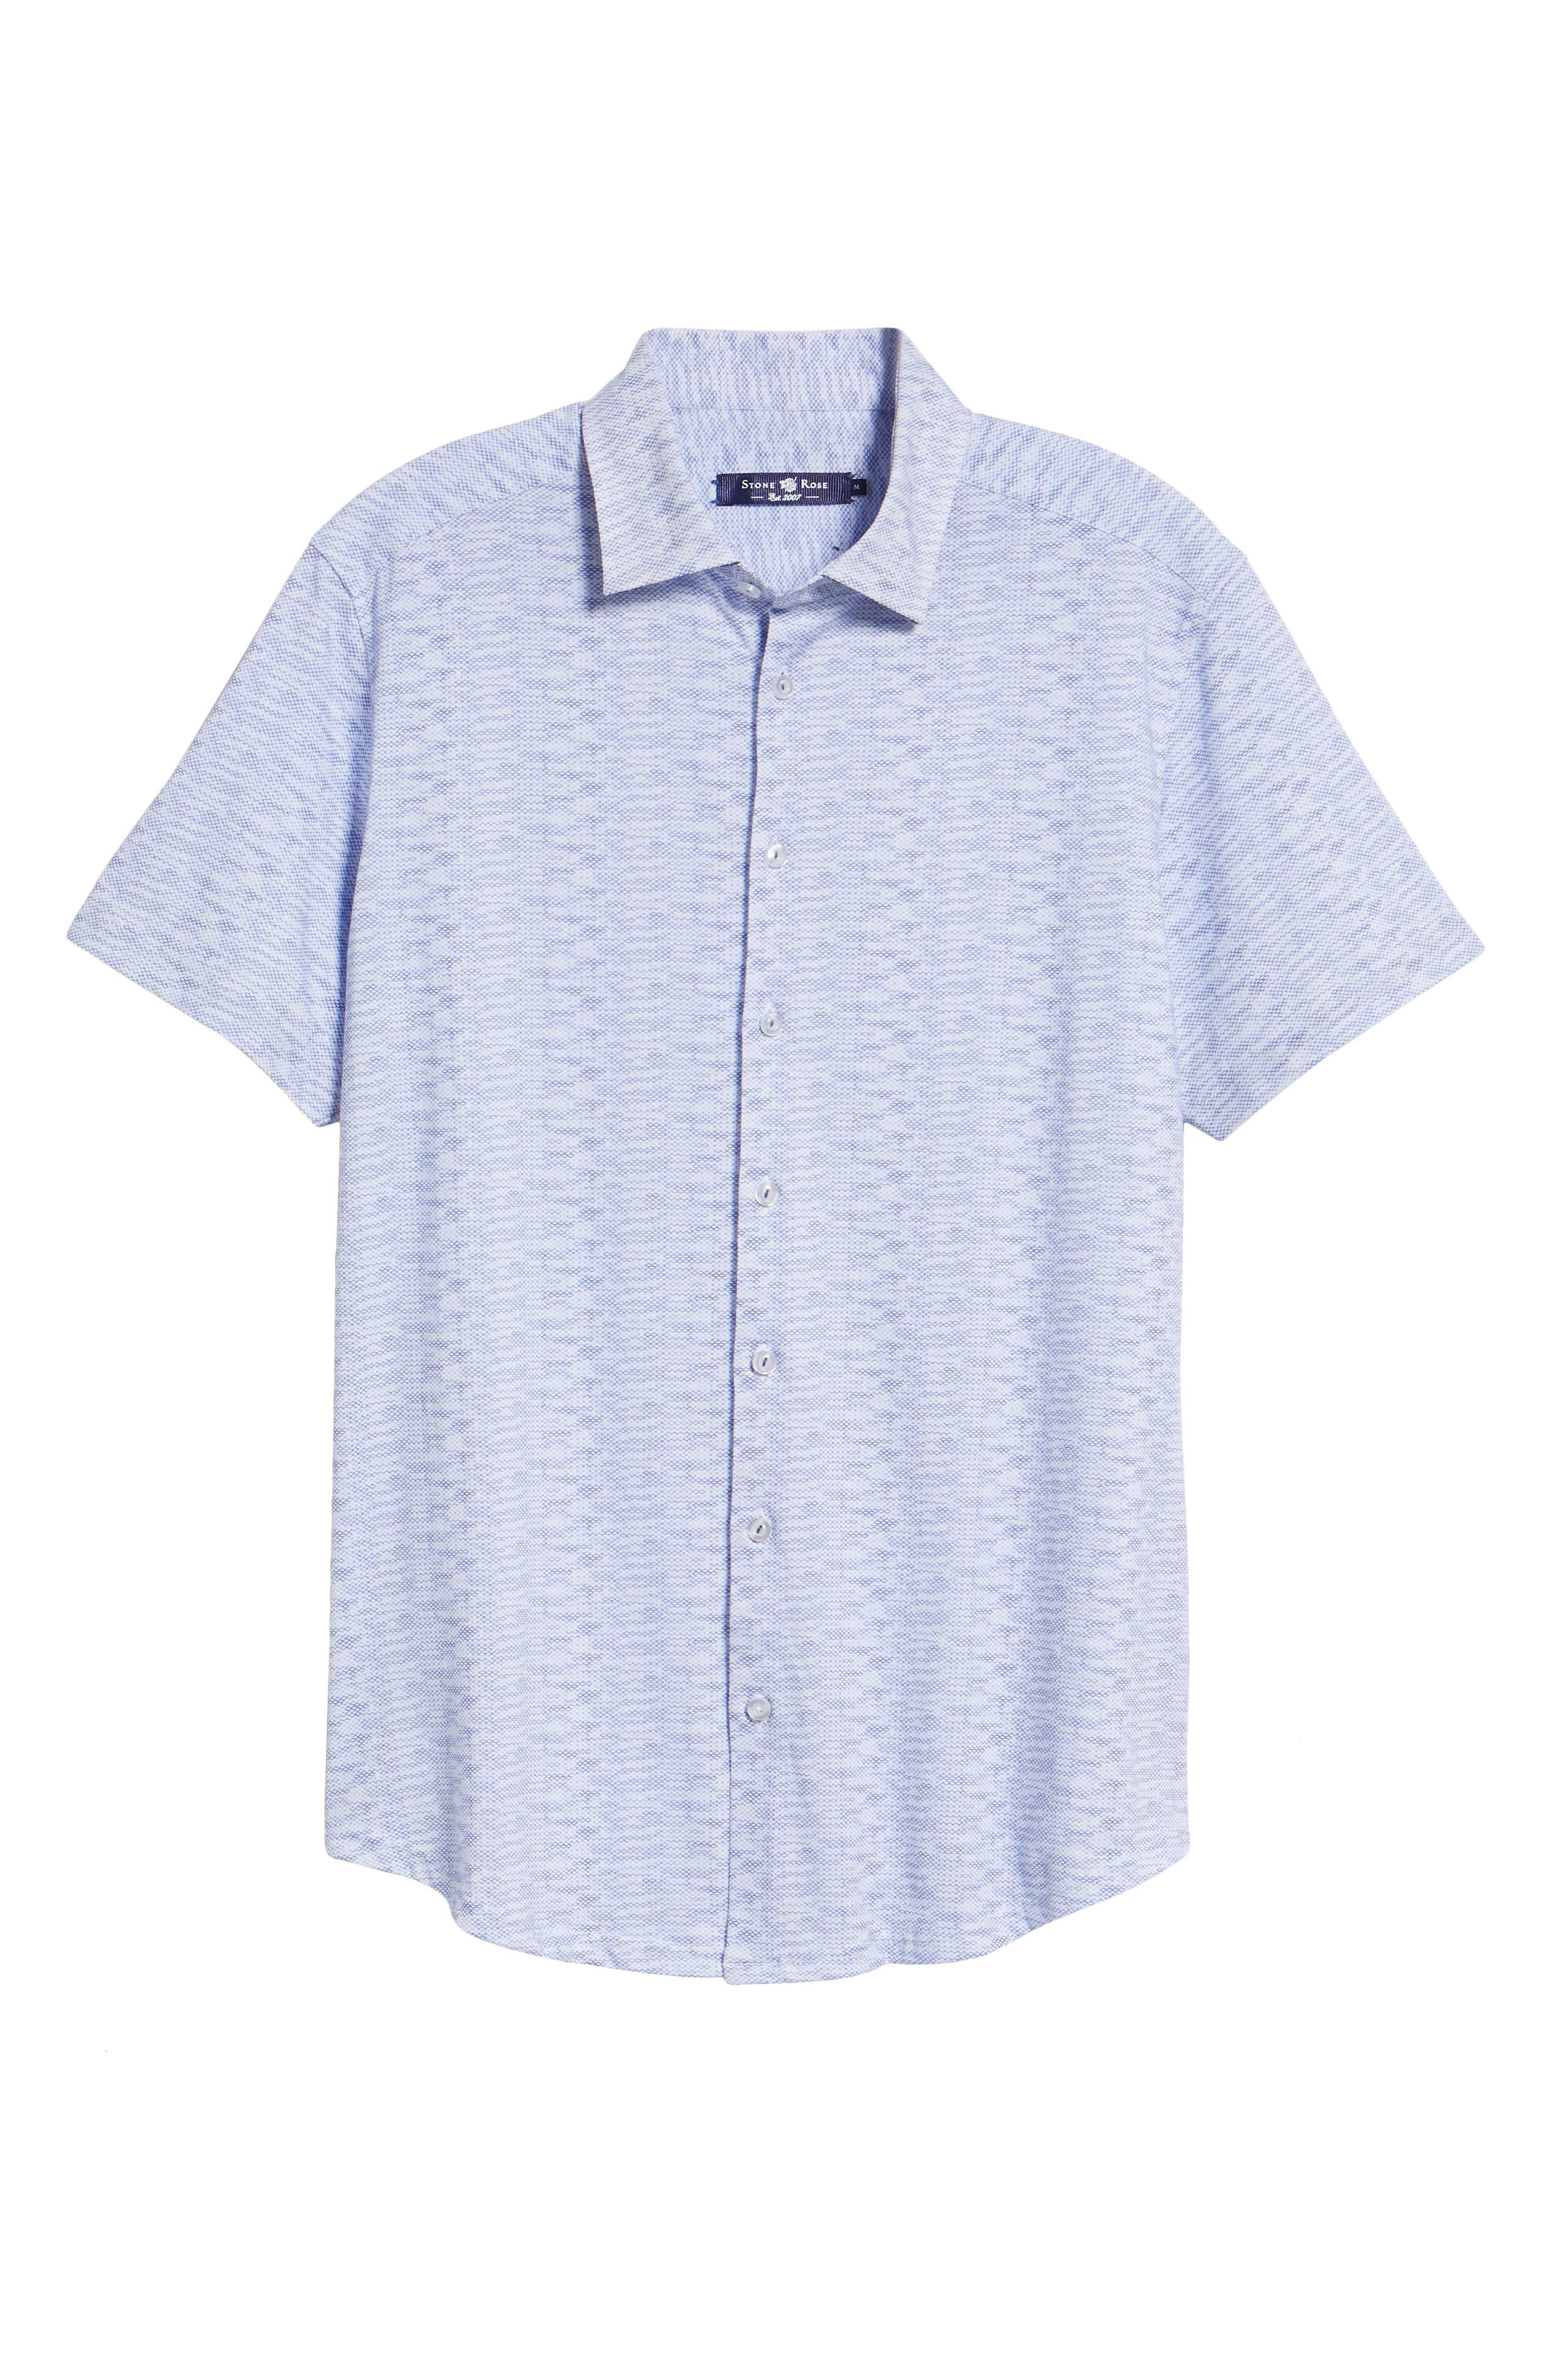 Heather Regular Fit Knit Sport Shirt,                             Alternate thumbnail 5, color,                             400